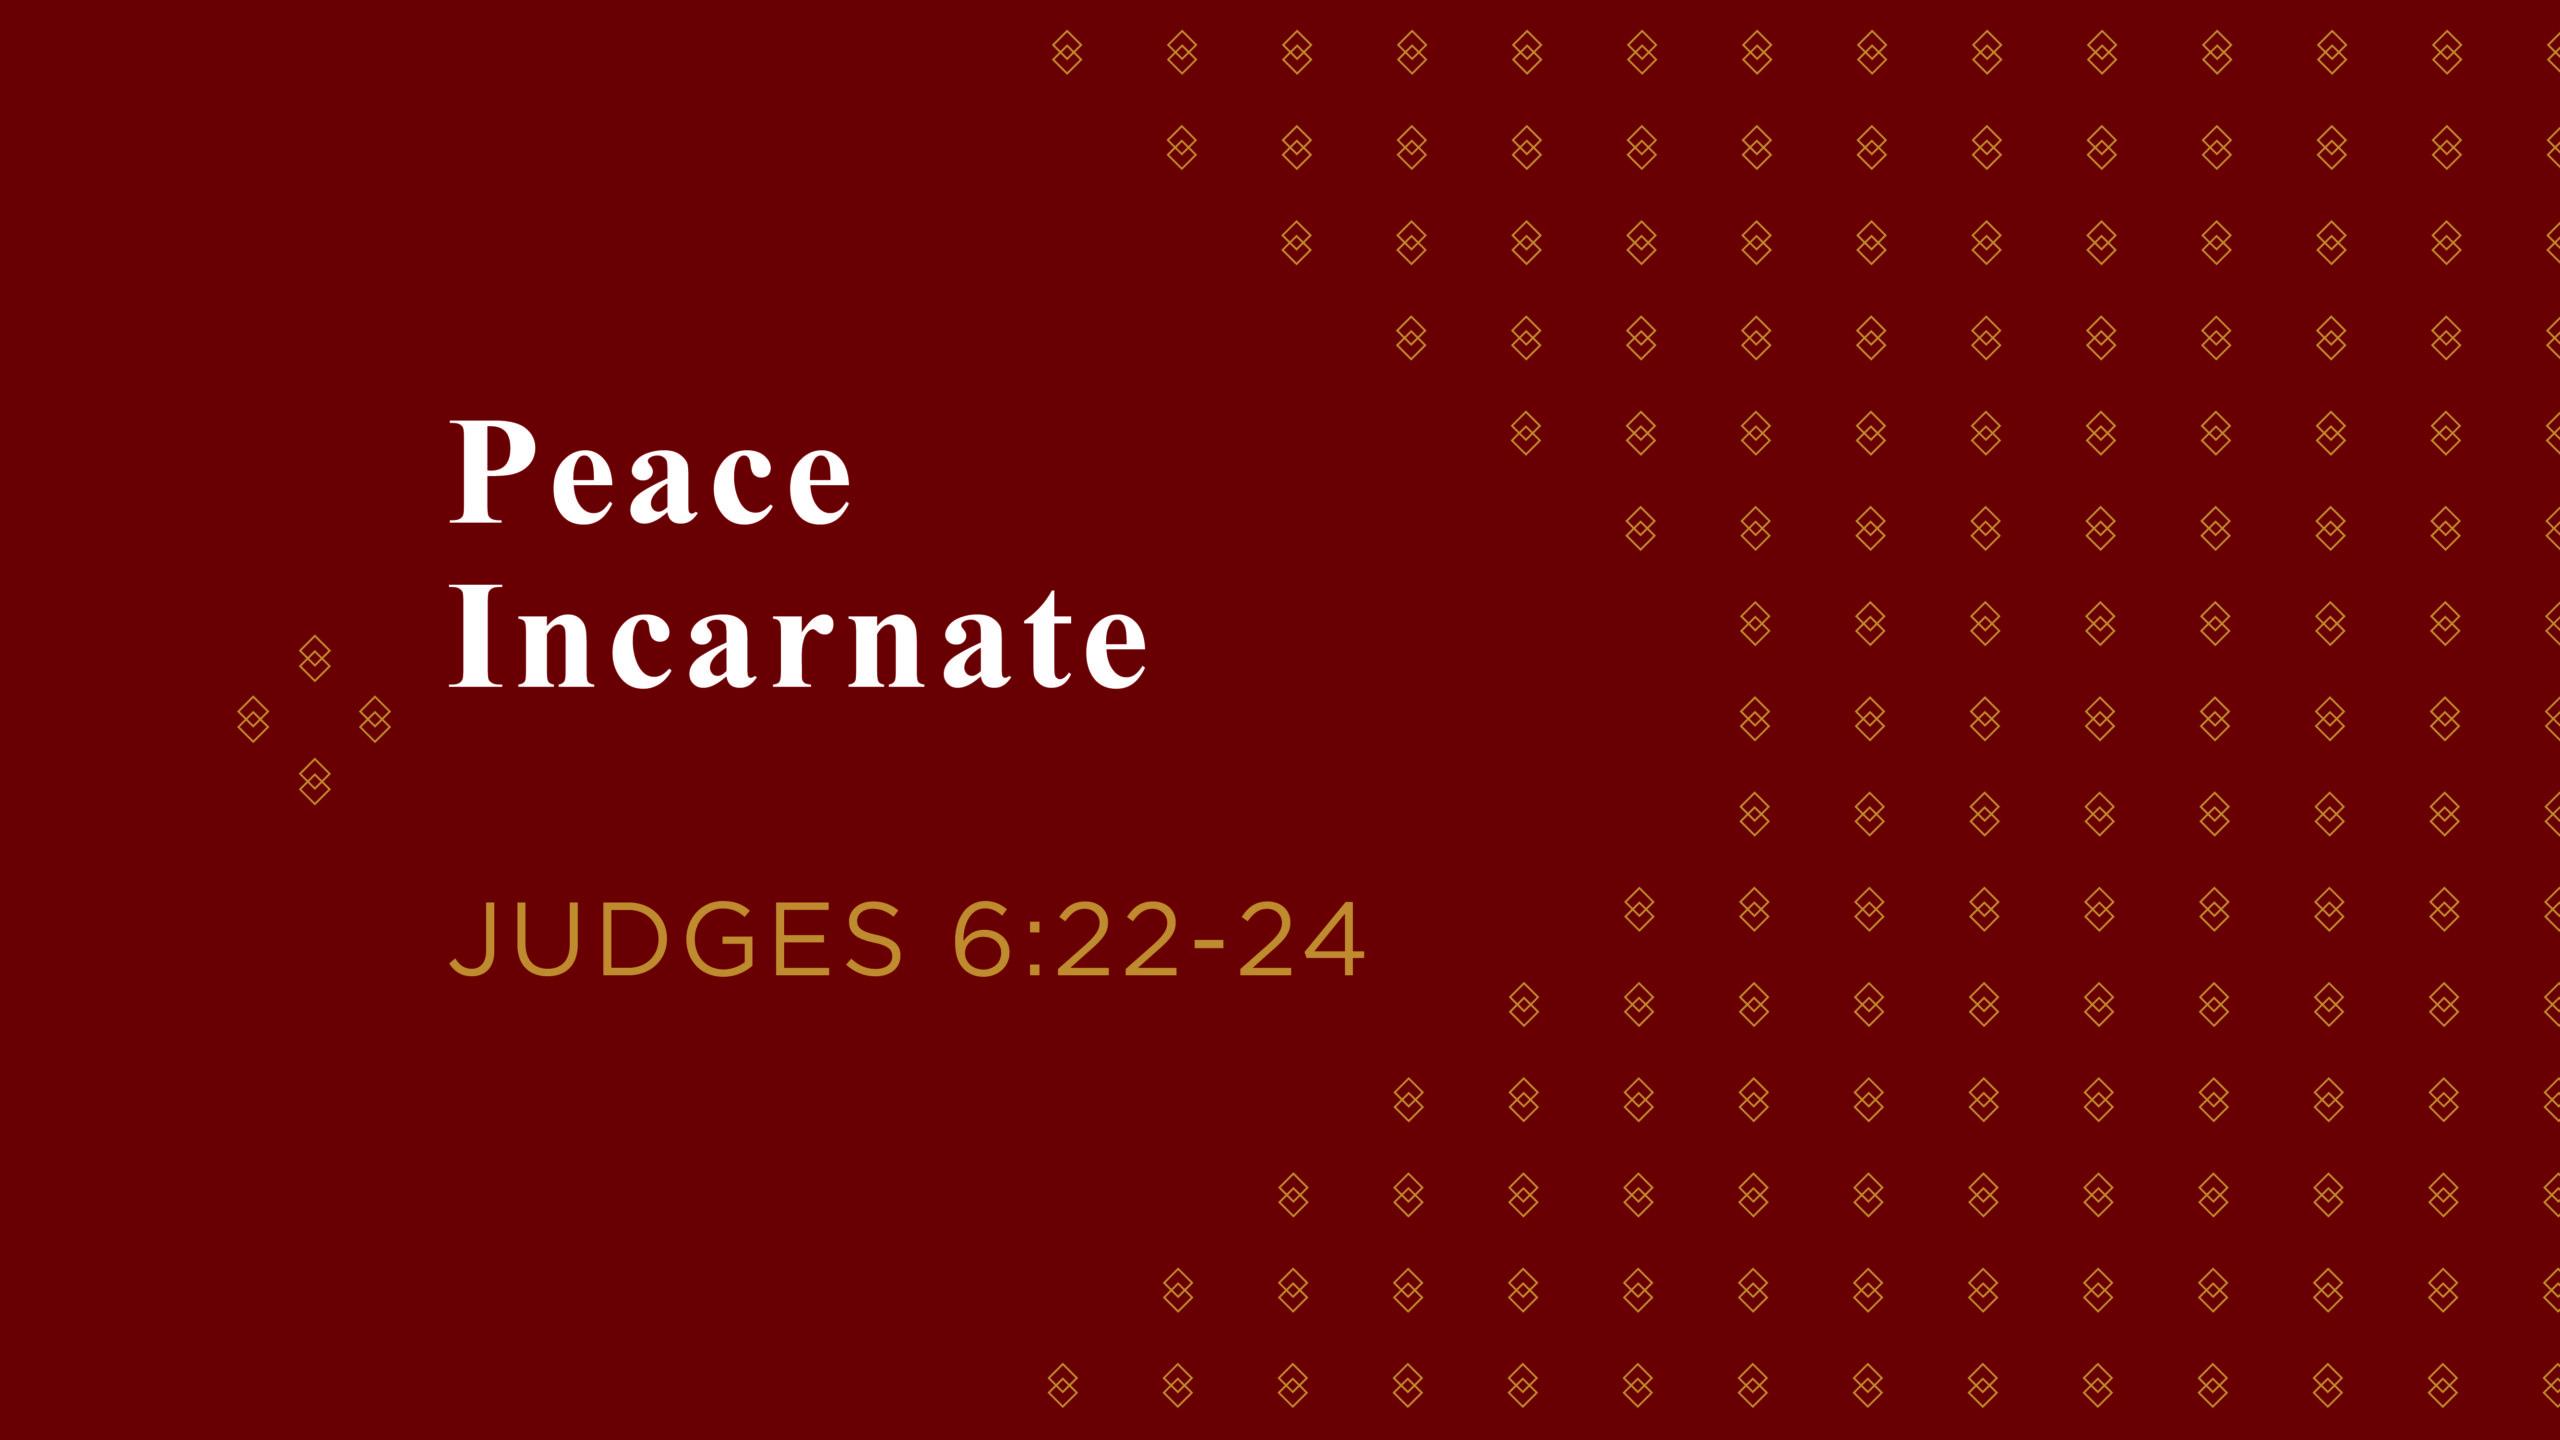 Peace Incarnate